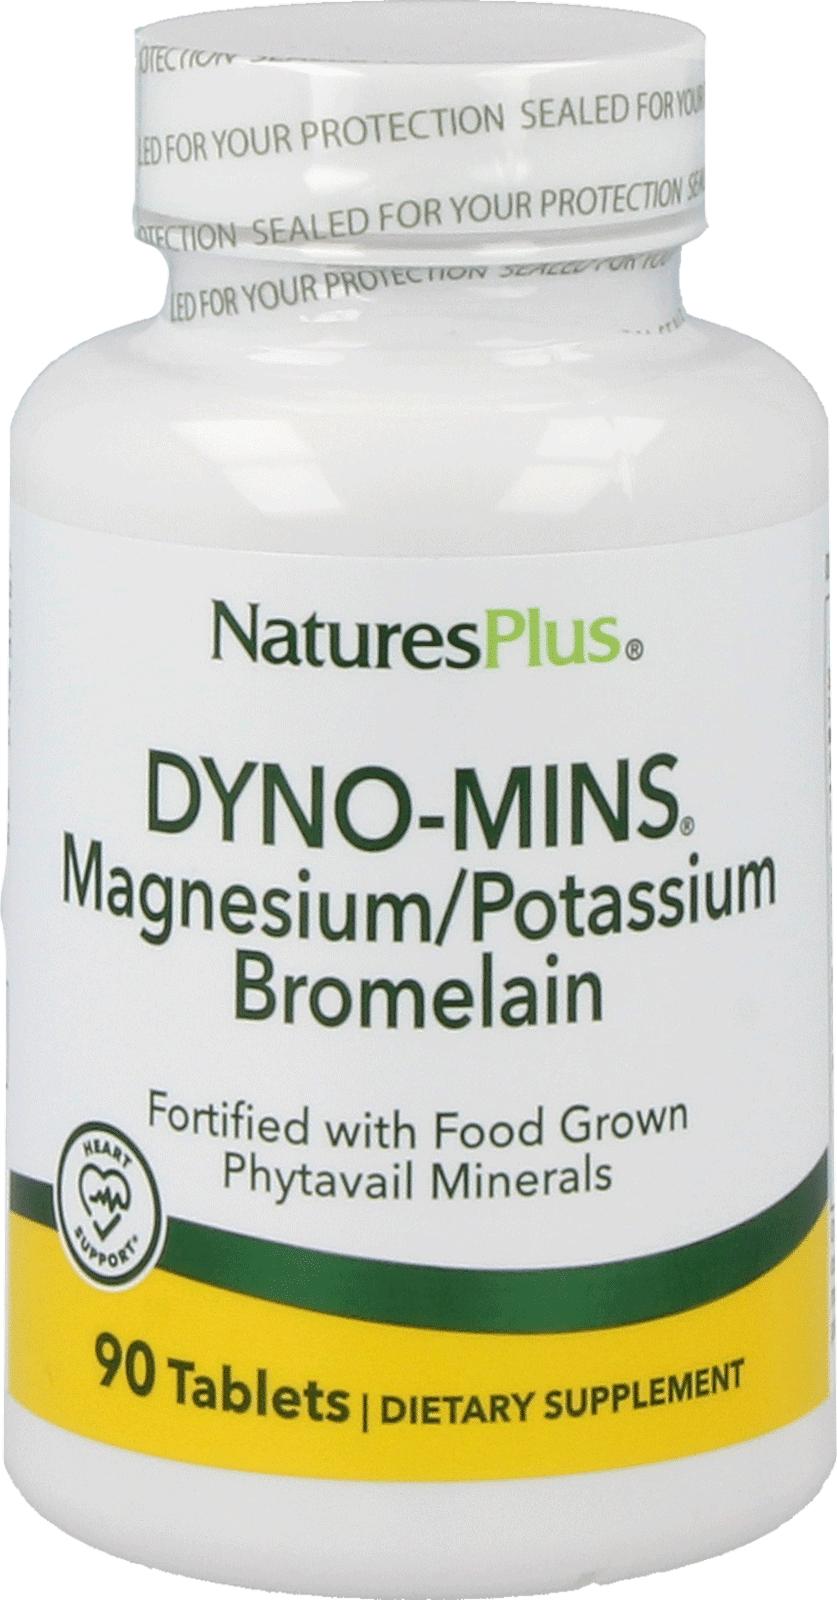 Dyno-Mins® Magnesium, Potassium & Bromelain